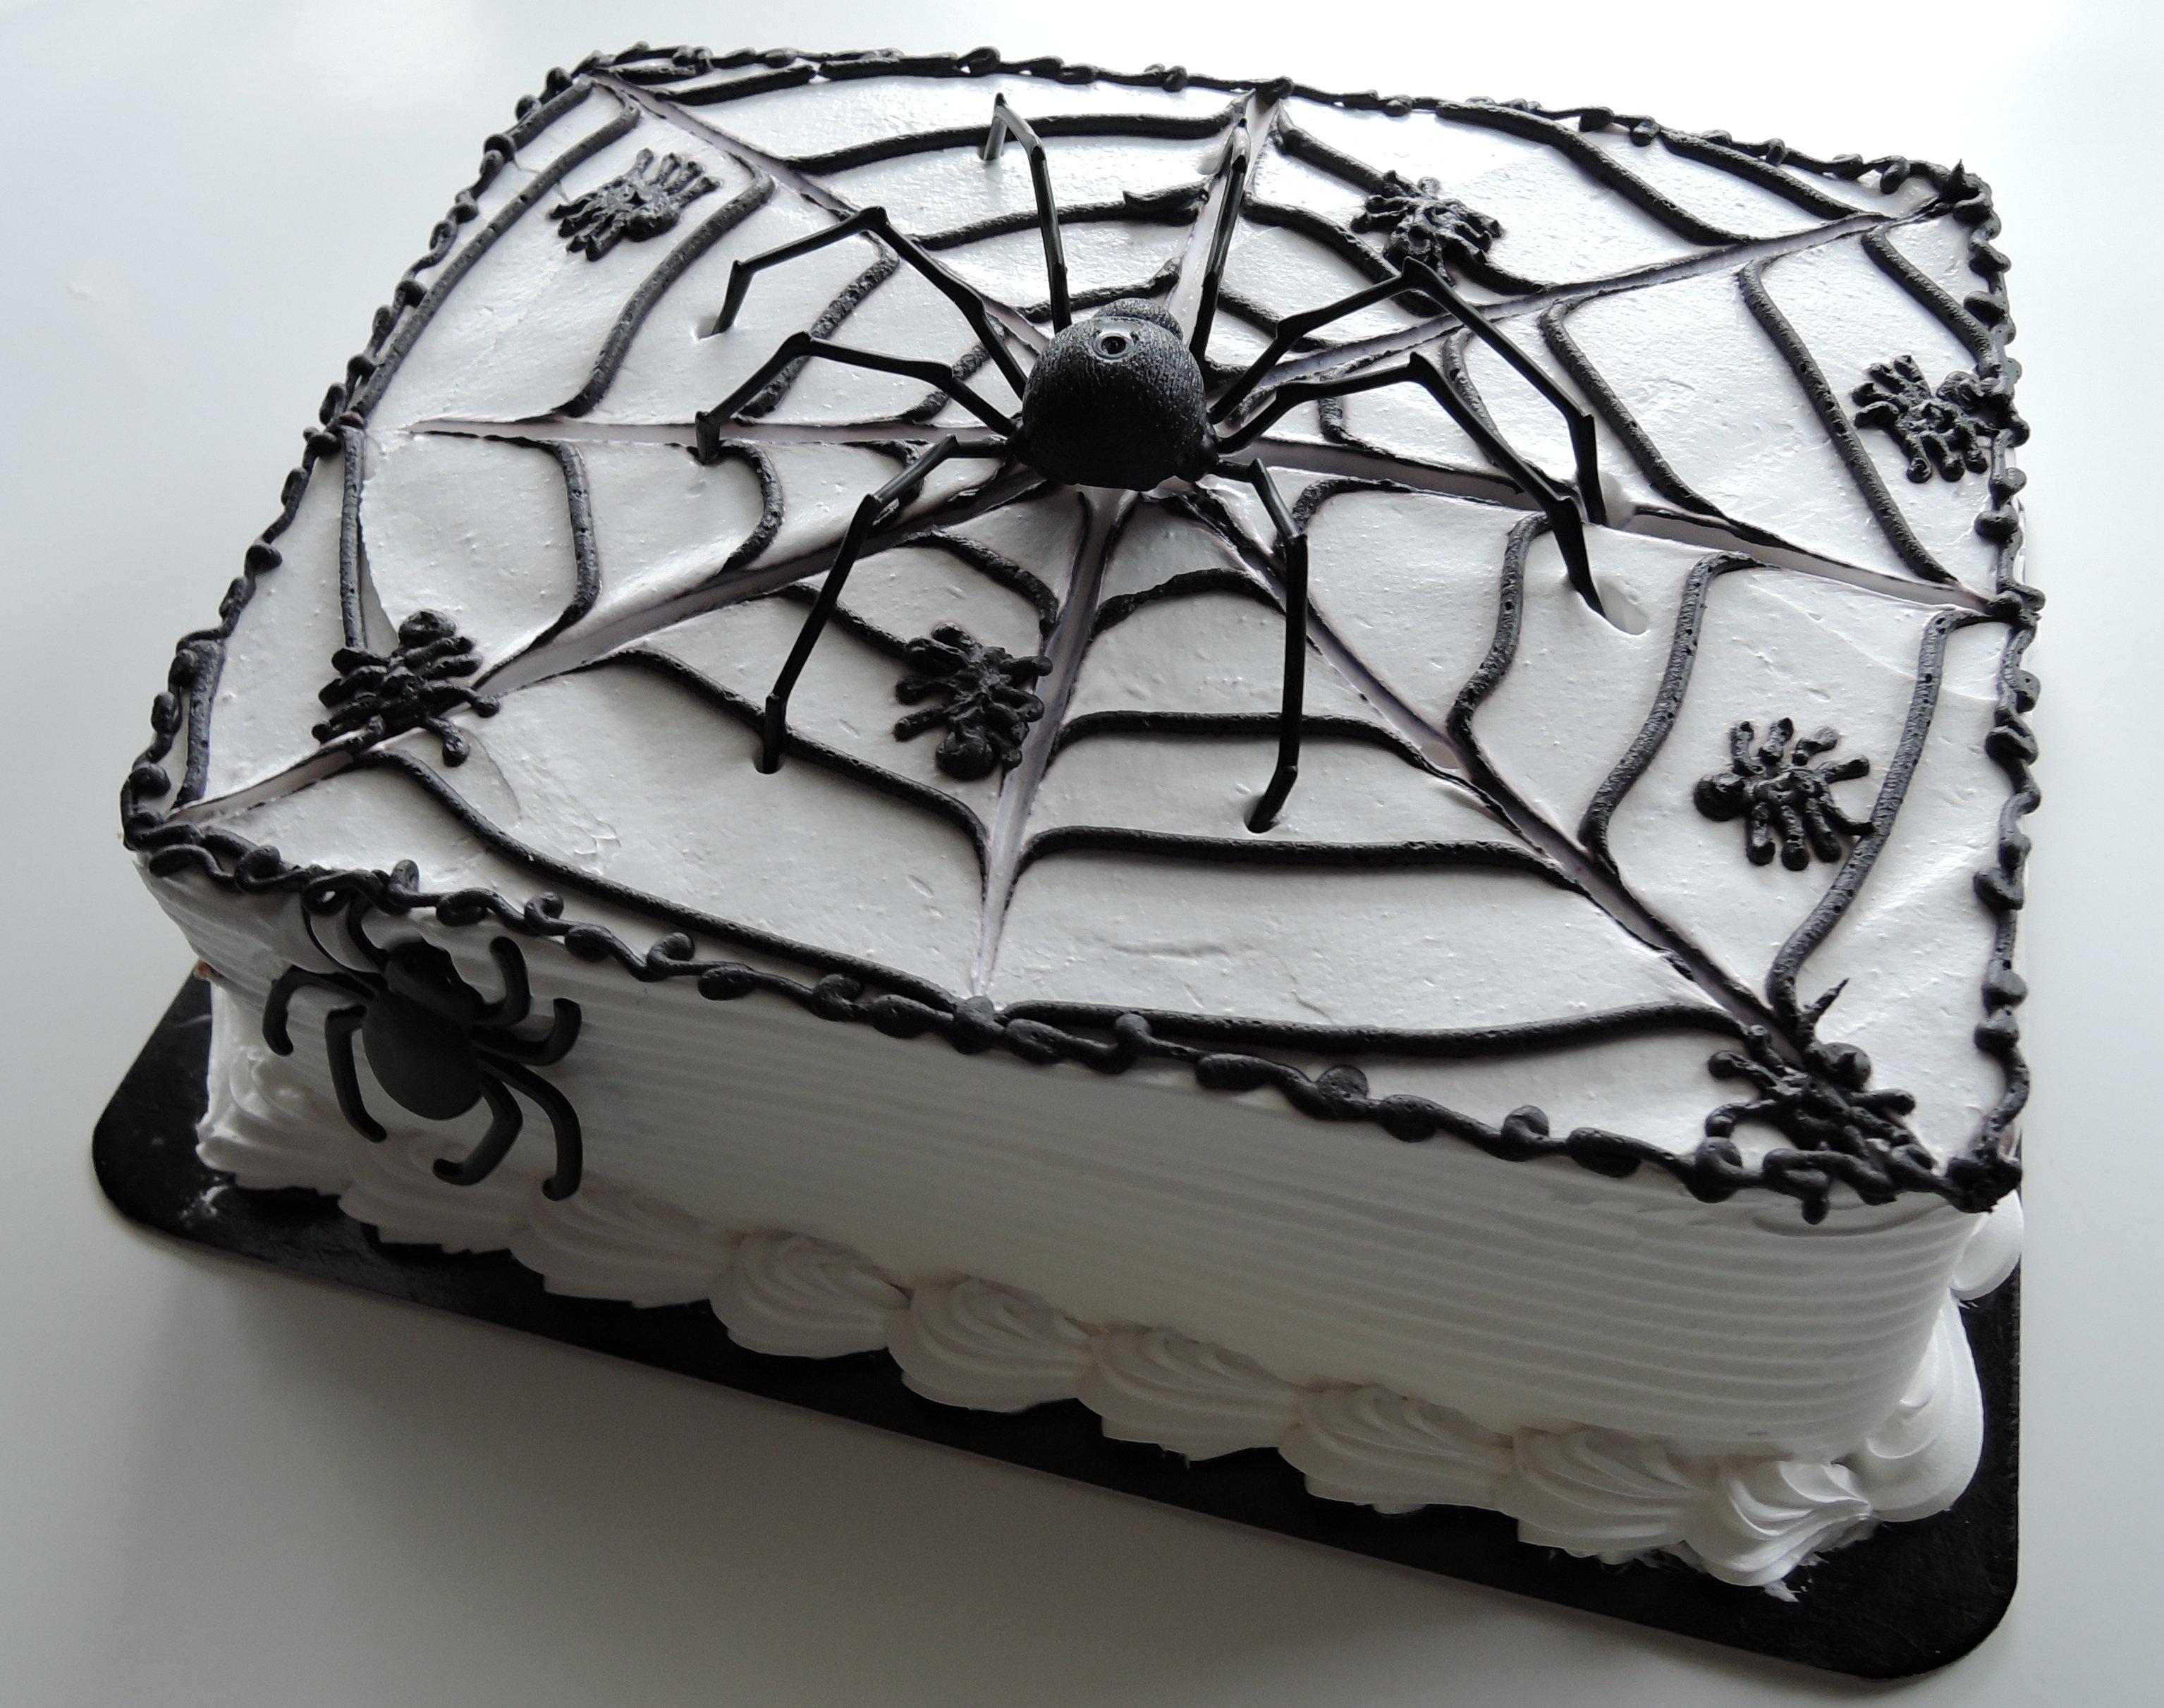 Astounding Free Images Web Food Dessert Birthday Cake Chocolate Cake Funny Birthday Cards Online Barepcheapnameinfo